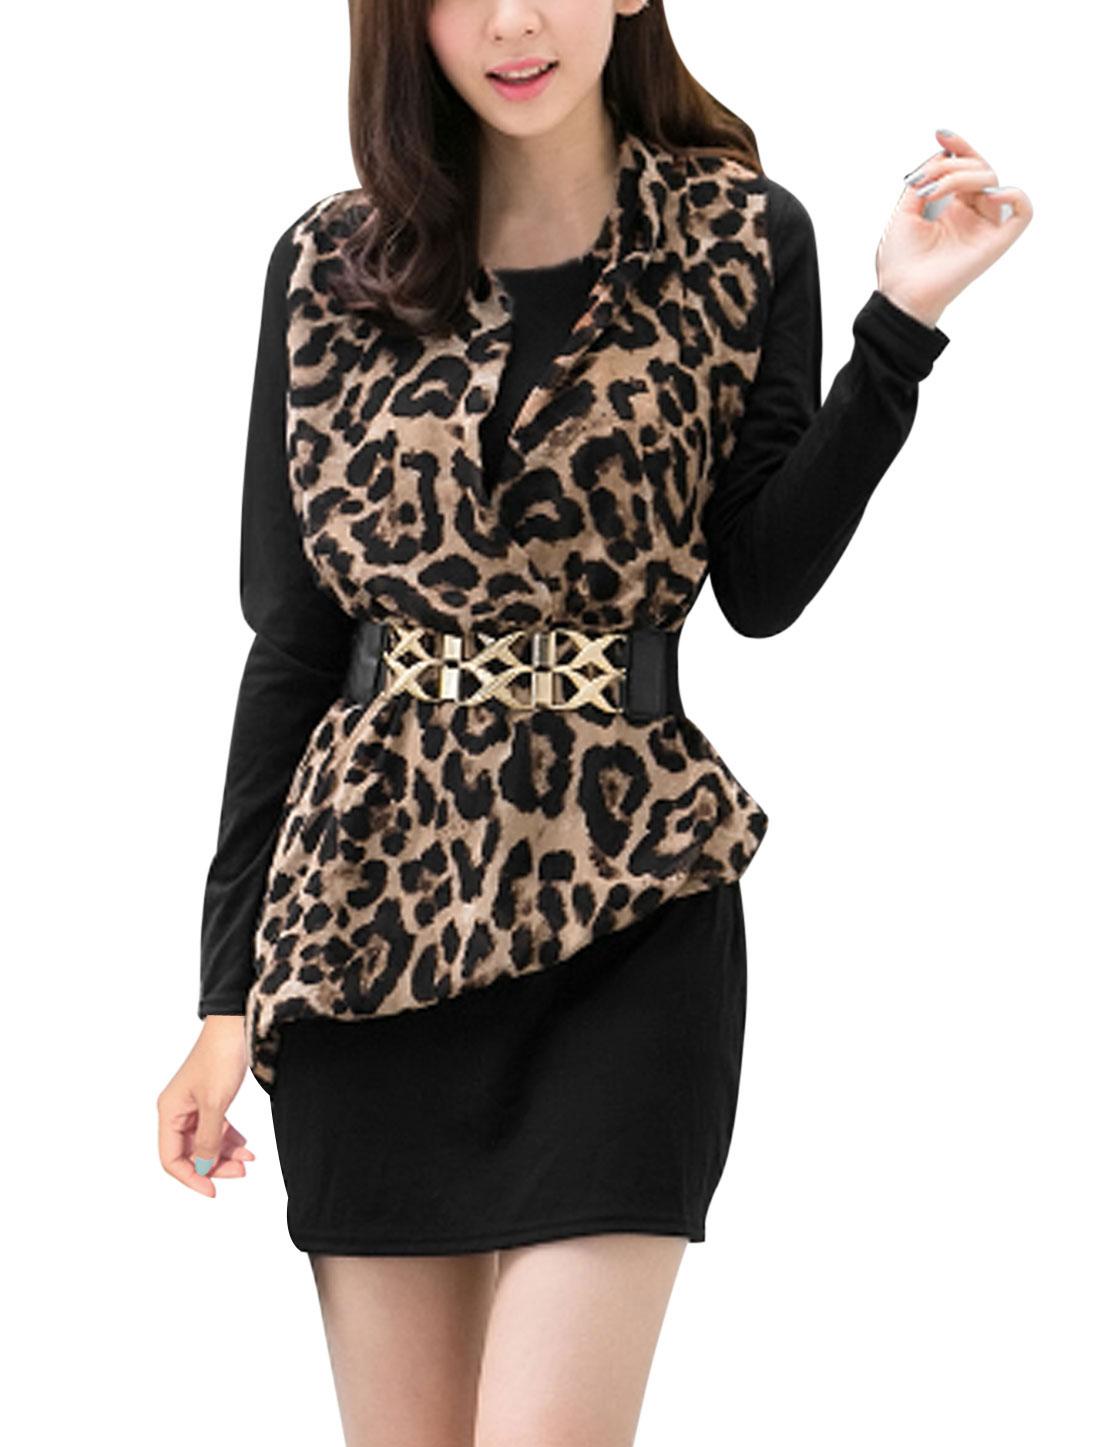 Ladies Black Long Sleeves Round Neck Chiffon Splice Slim Fit Dress S